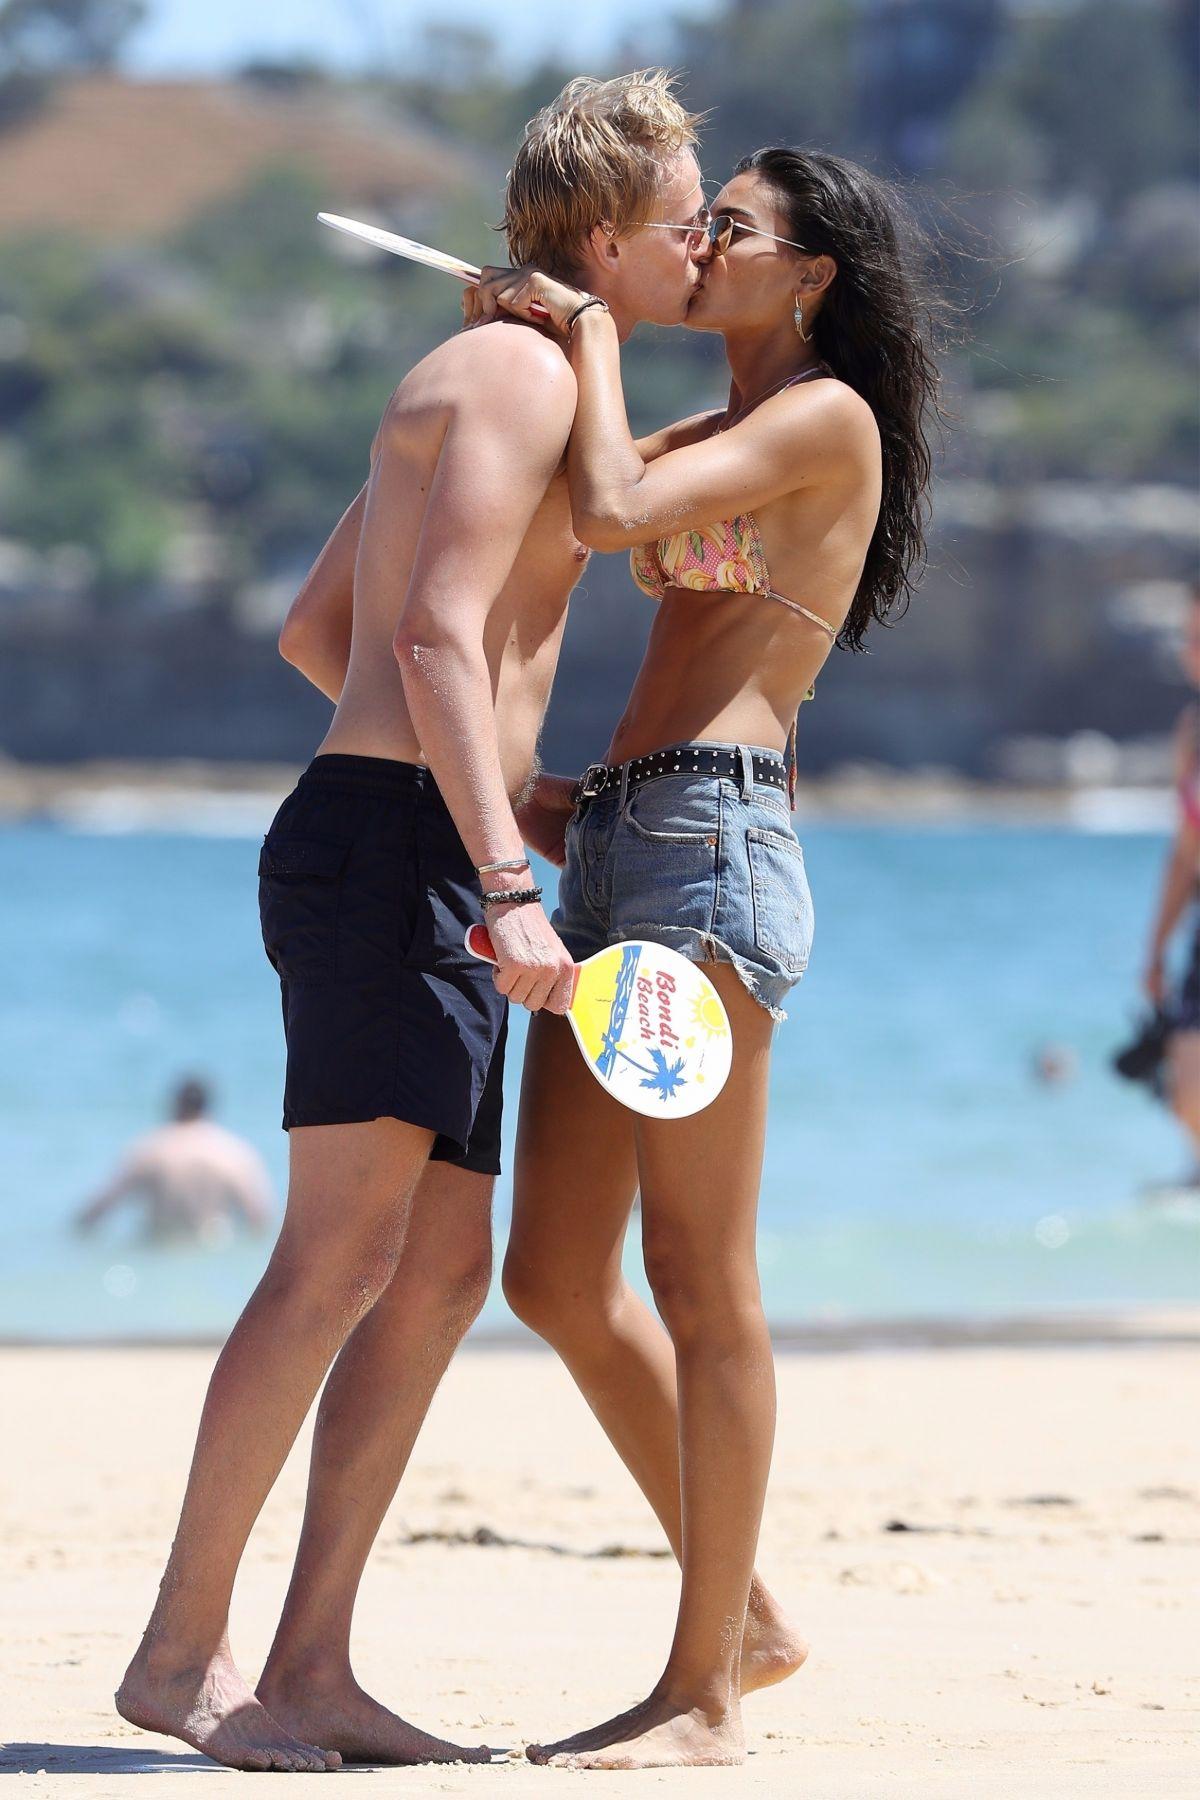 Kelly Gale in Bikini on Bondi Beach in Sydney Pic 27 of 35